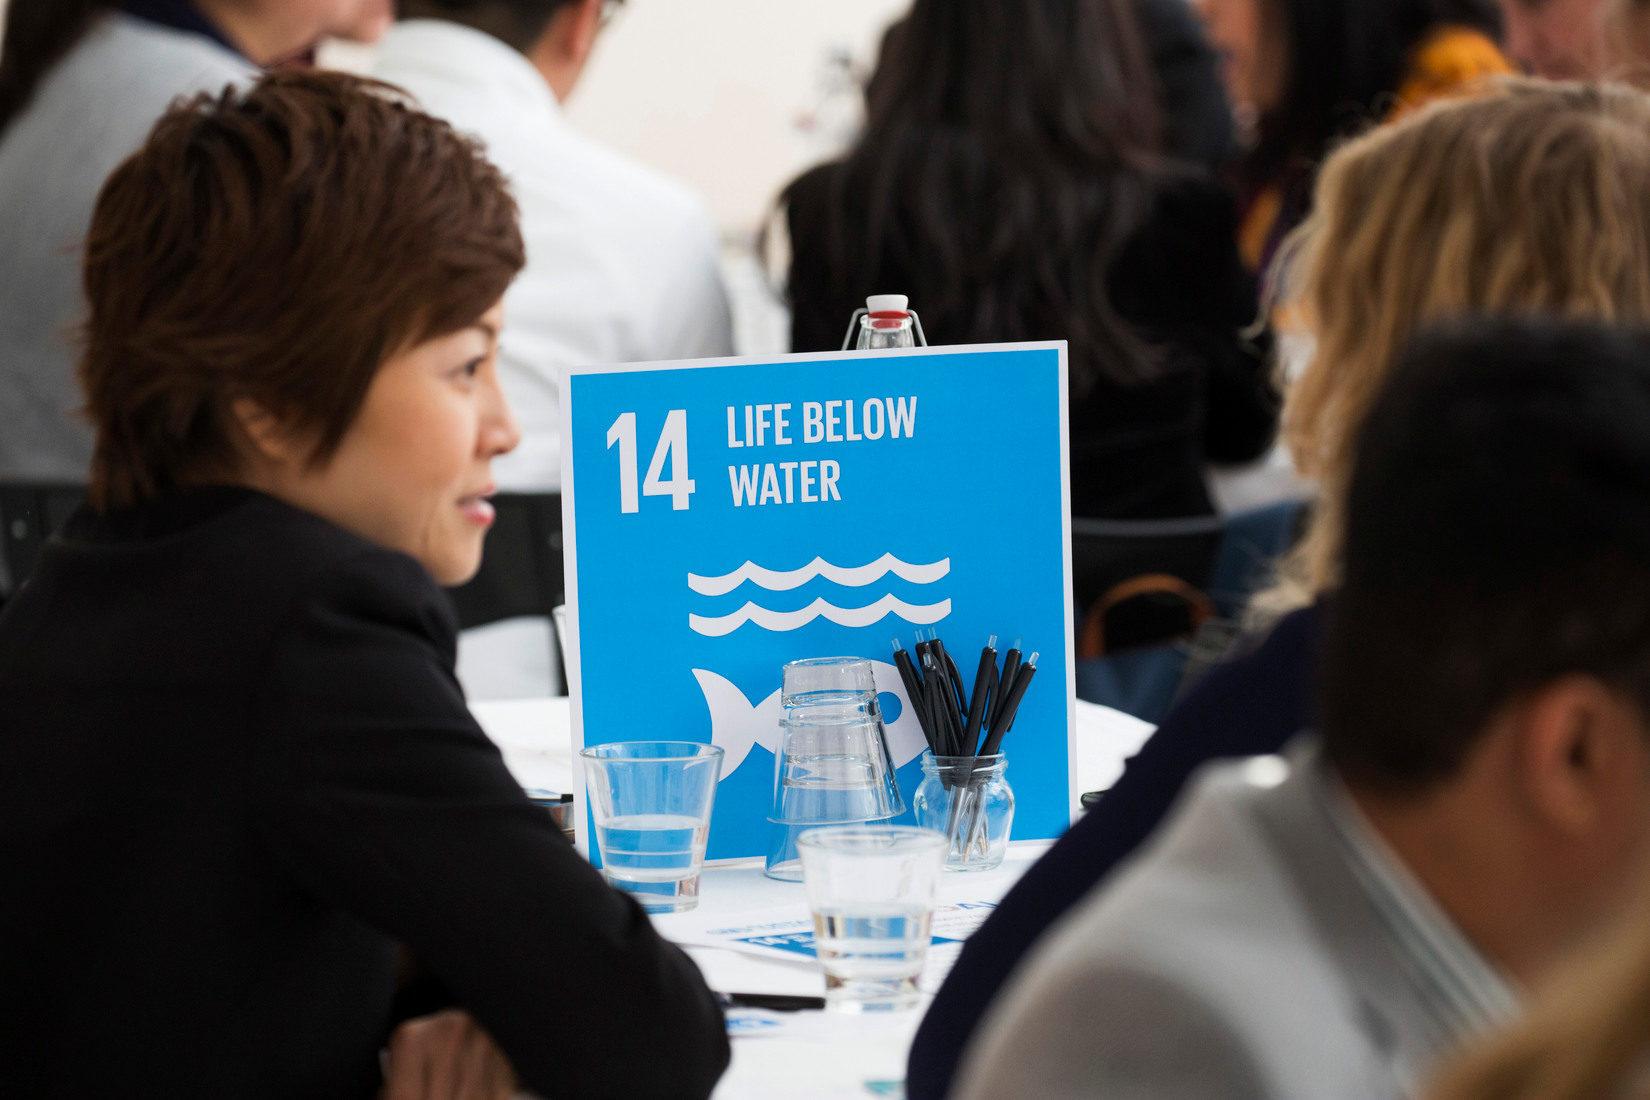 Deltagare i Swedish Institute Mangagement Programme Asien samtalar vid ett bord.